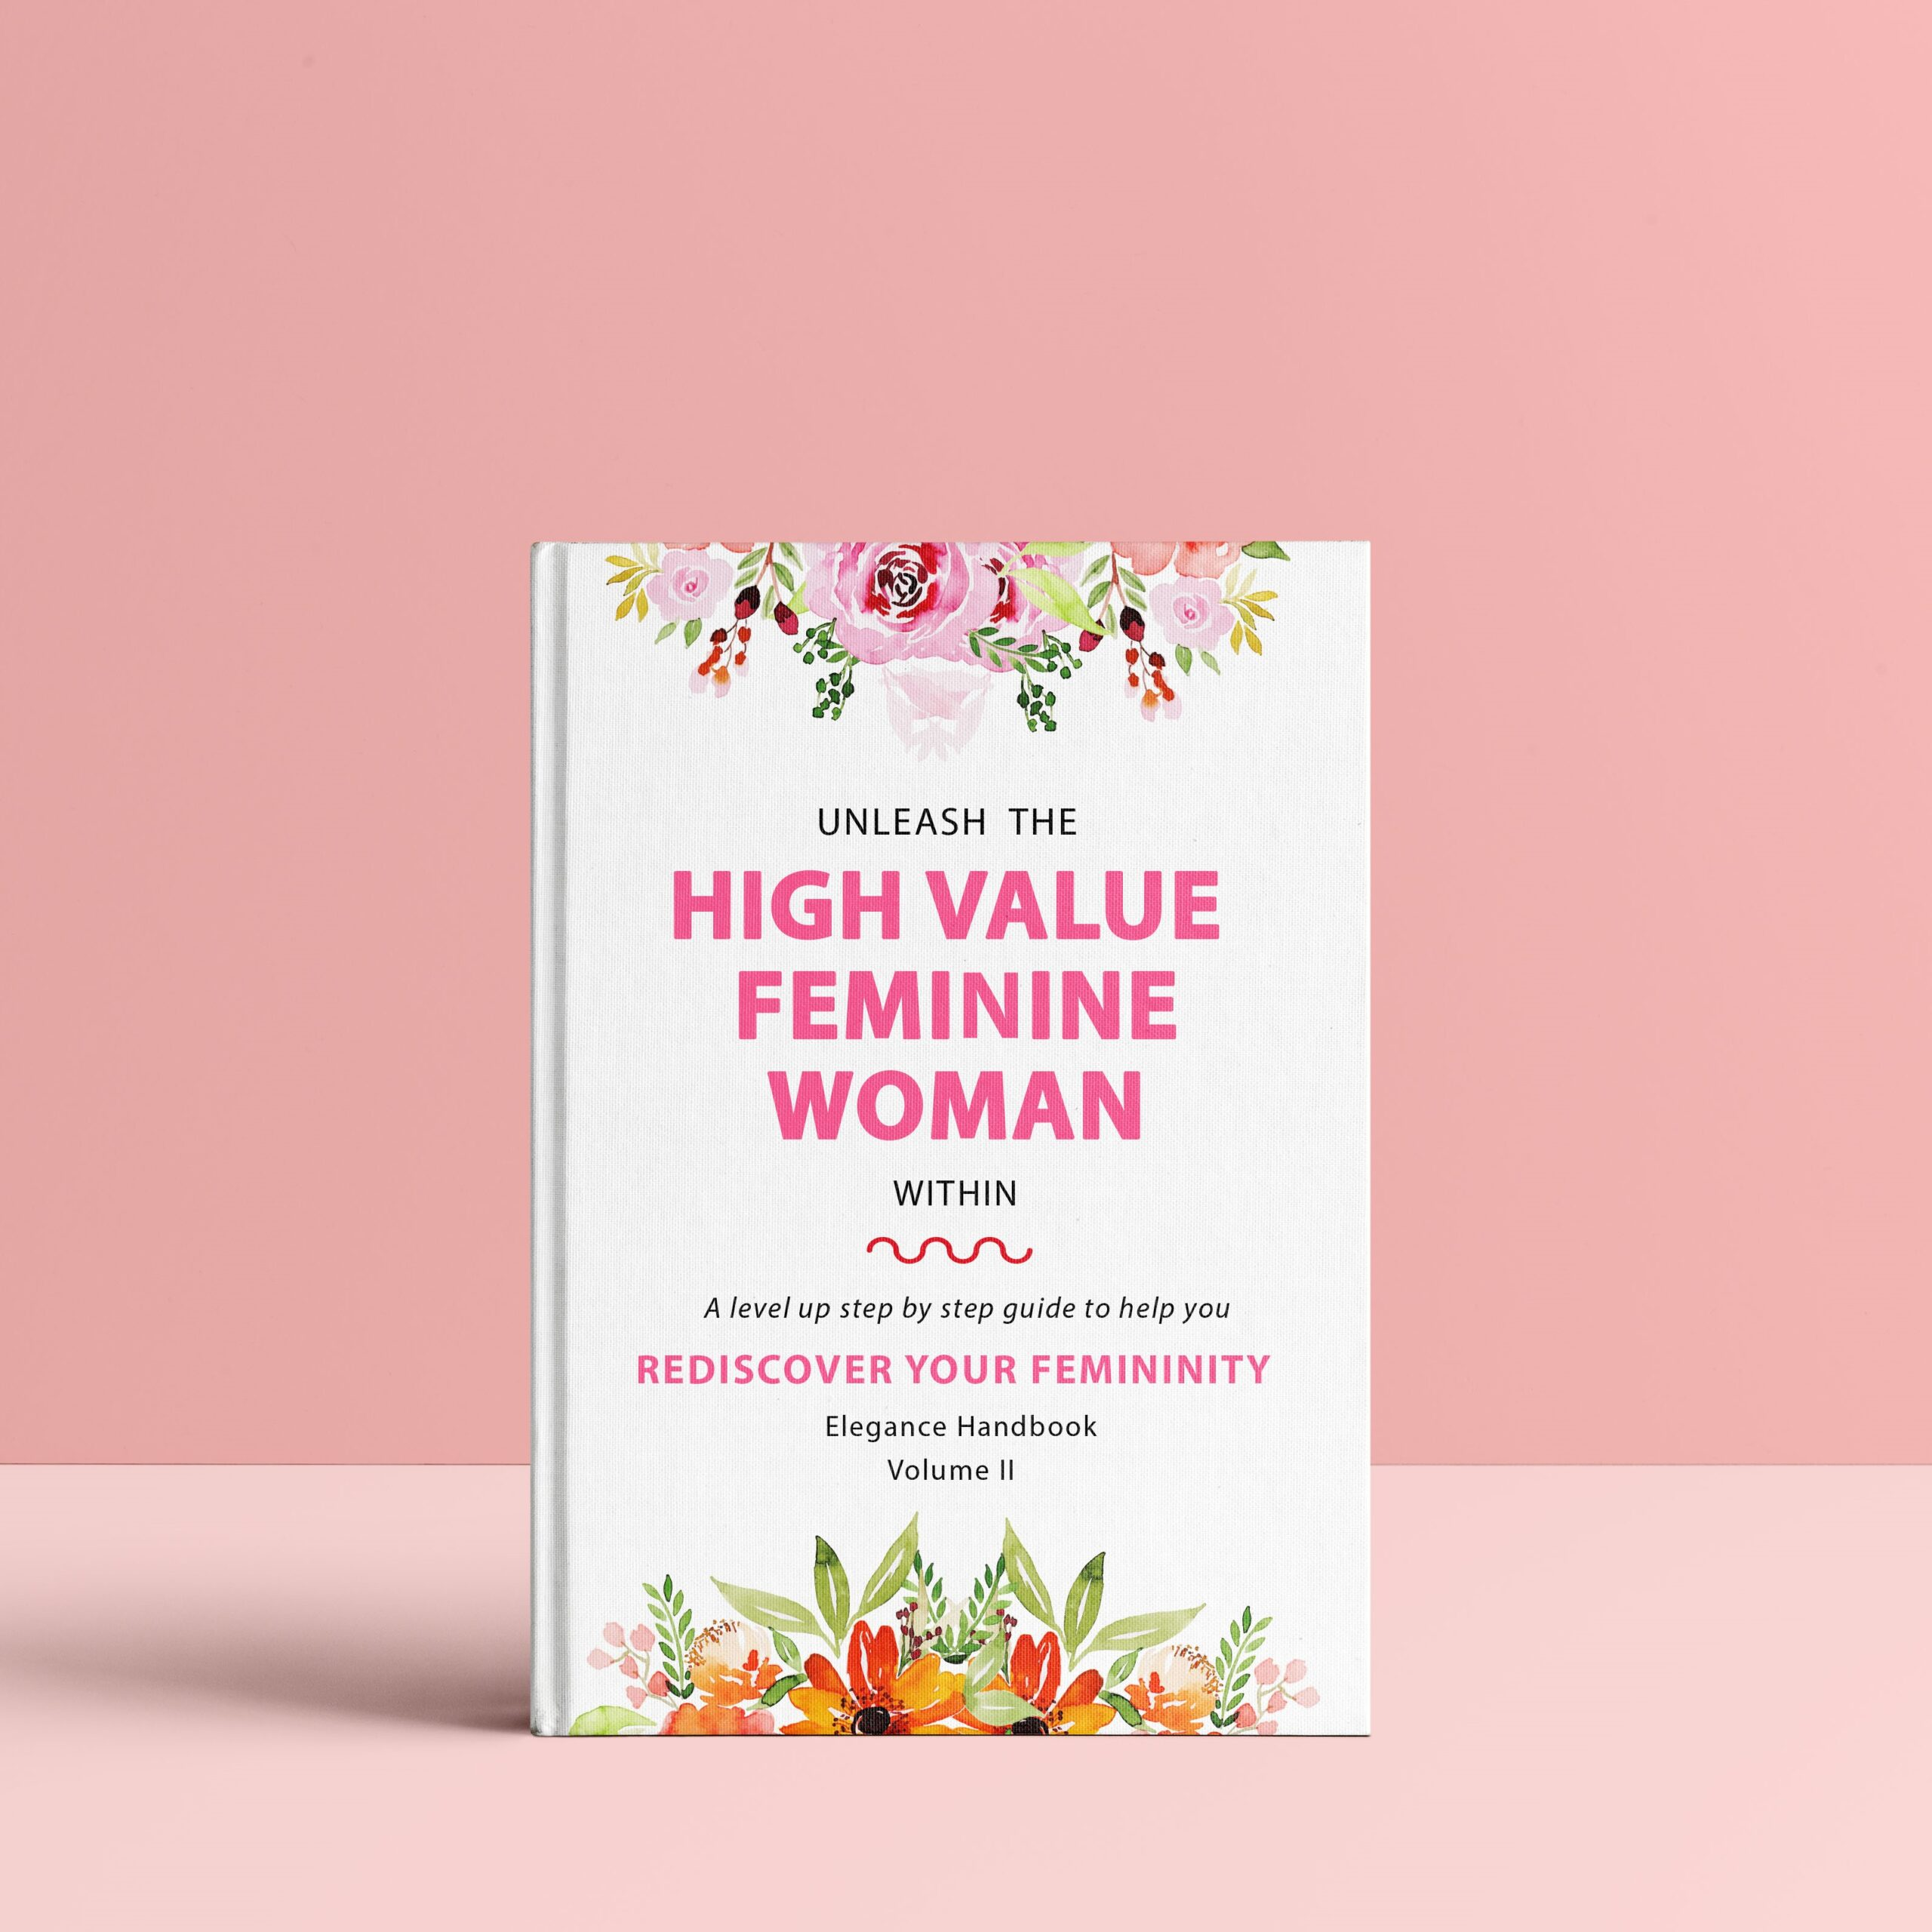 Elegance Handbook Hard Cover Femininity Book II MockUp